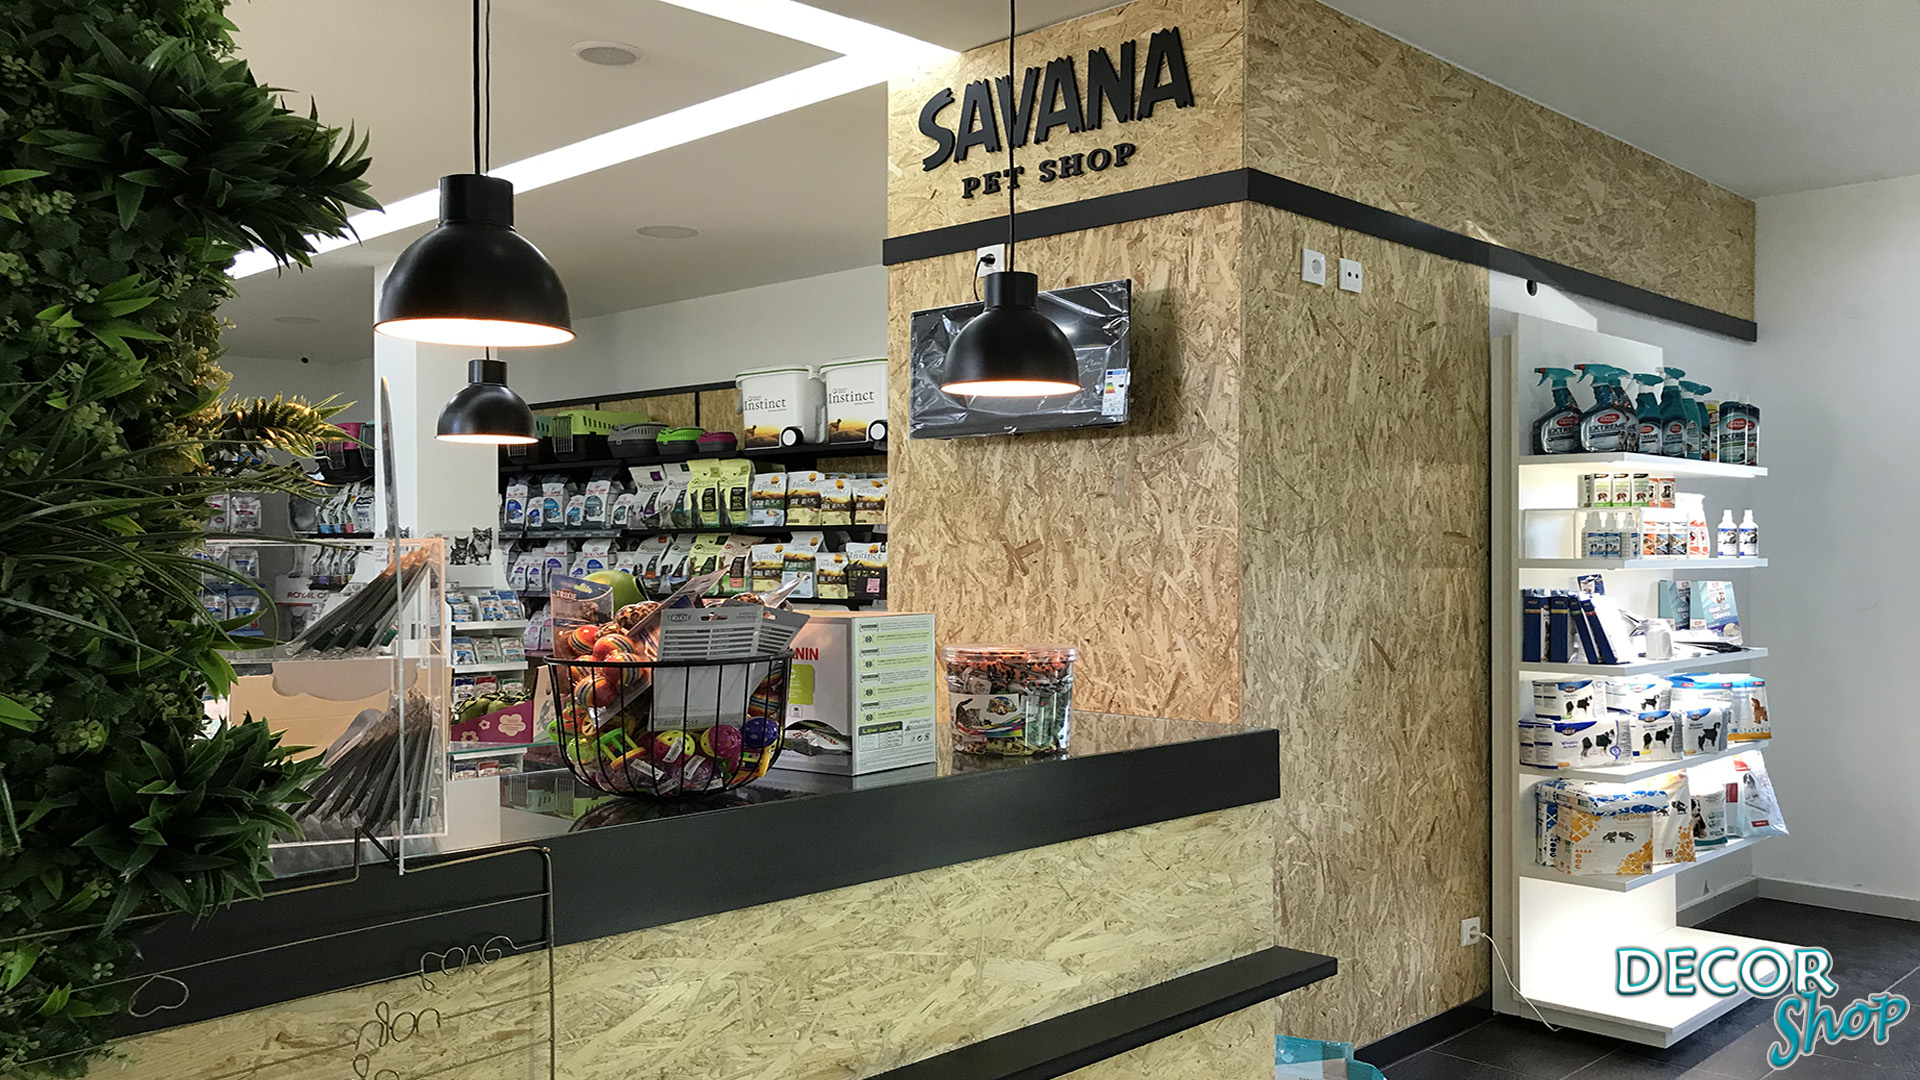 9 - SAVANA Pet Shop